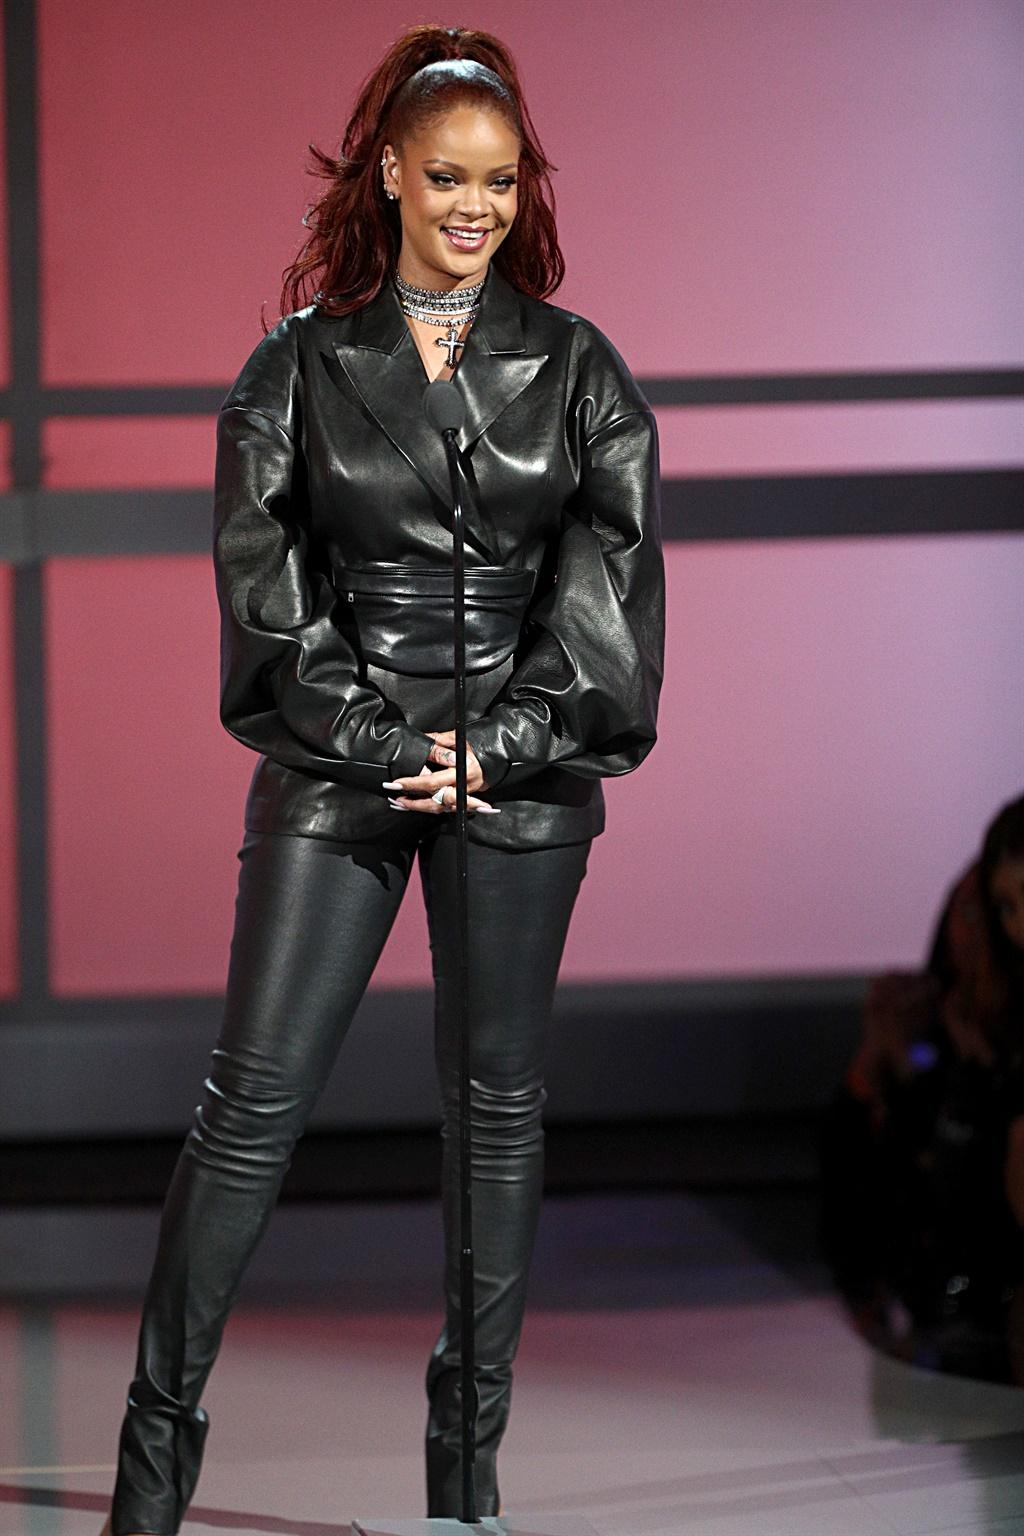 LOS ANGELES, CALIFORNIA - JUNE 23: Rihanna speaks